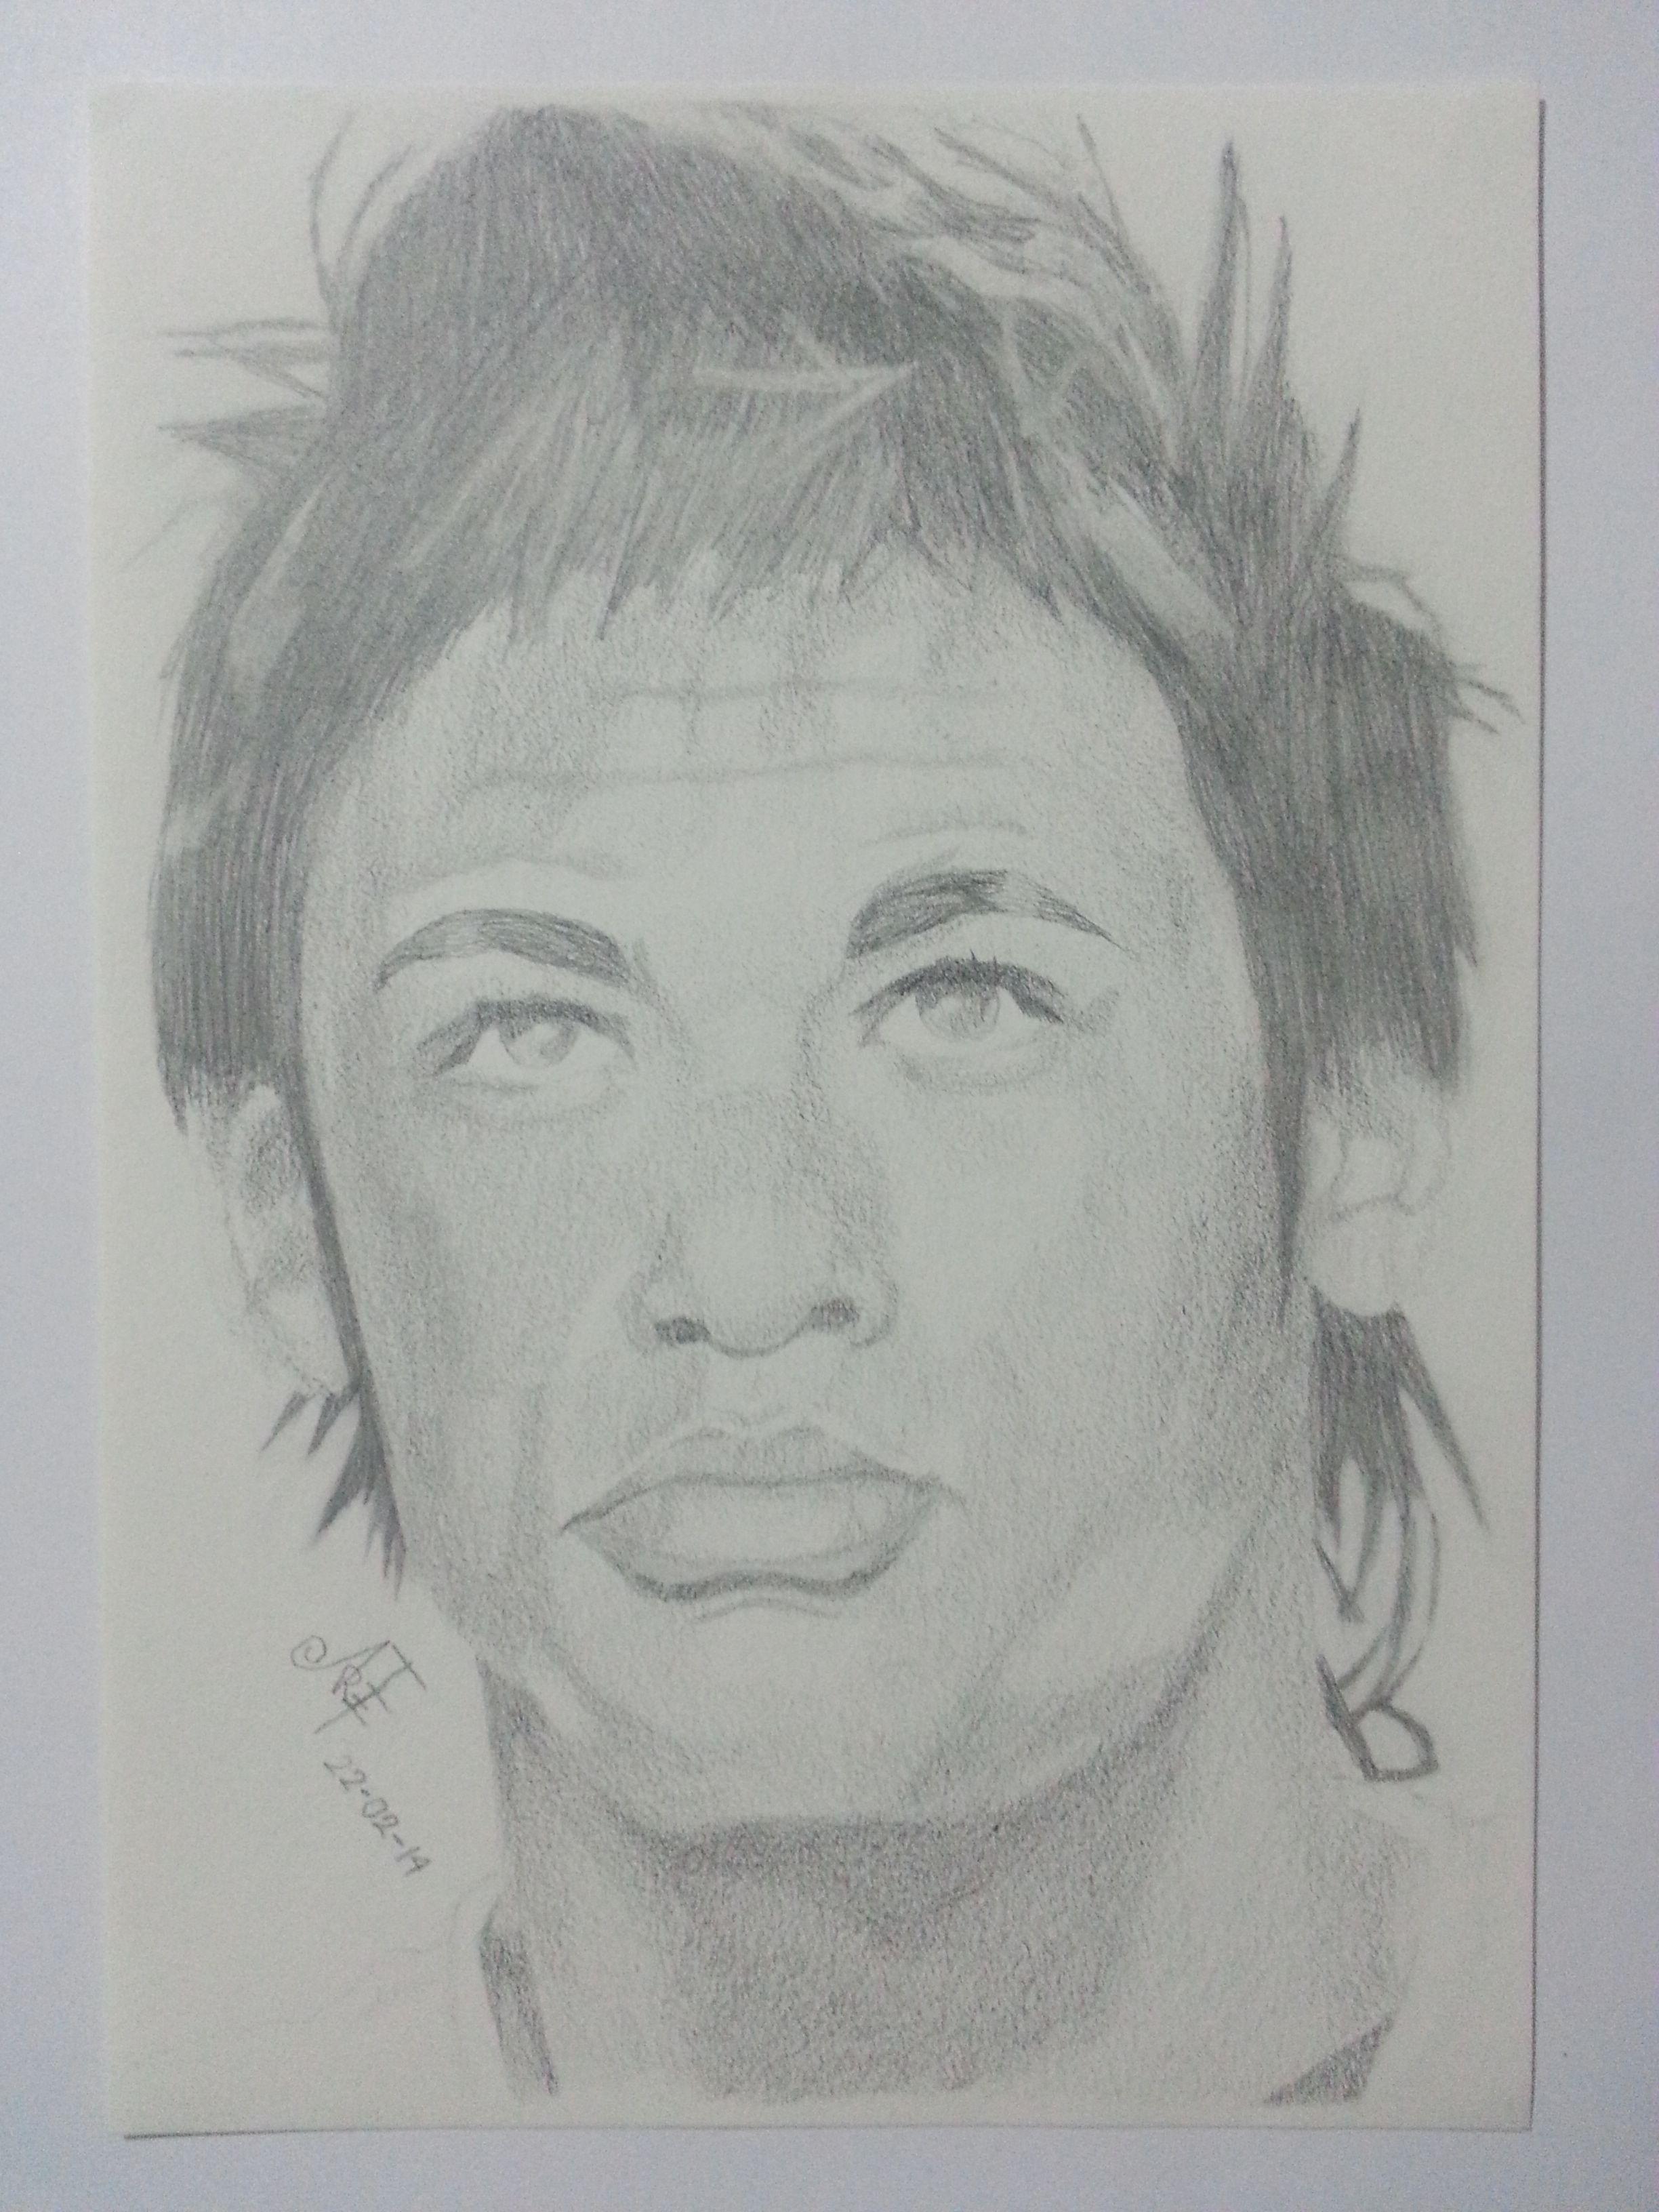 Neymar drawing neymar drawing pencil art portrait sketch sketchbook